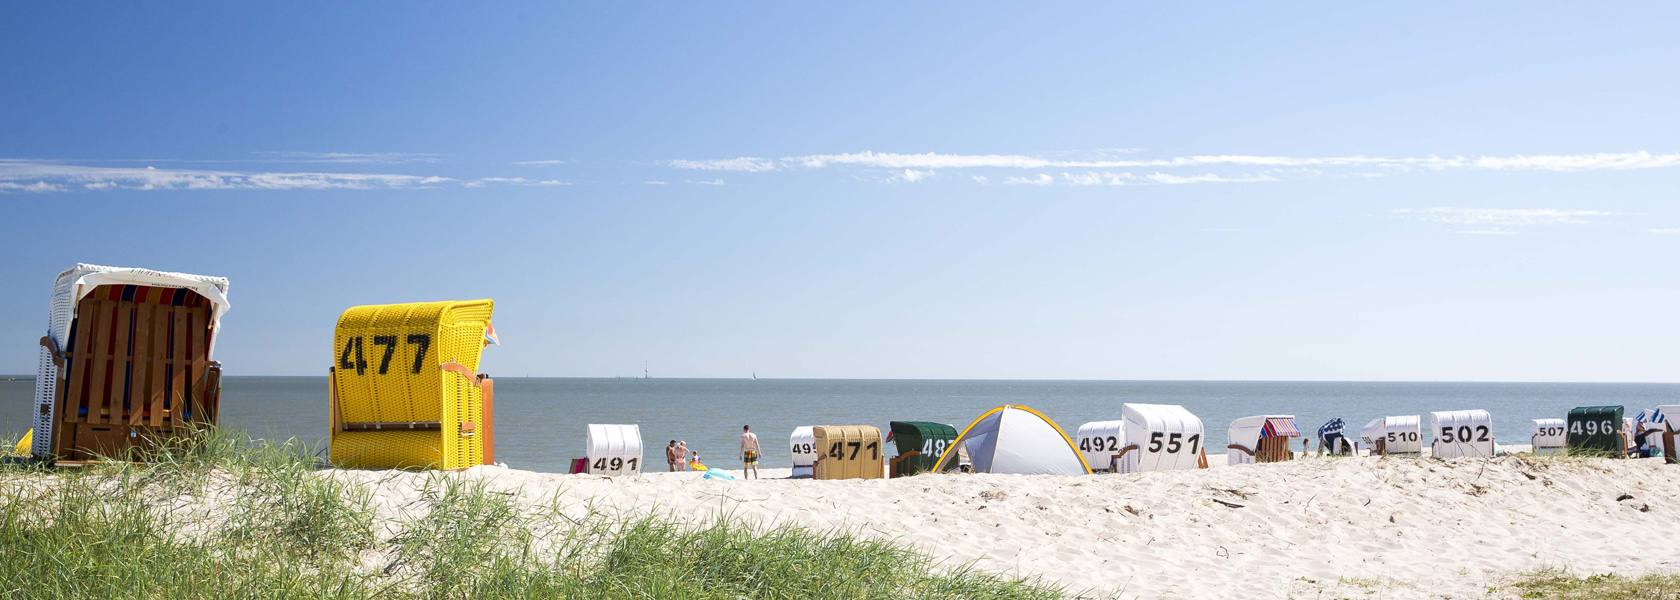 Strand im Wangerland, © Wangerland Touristik GmbH